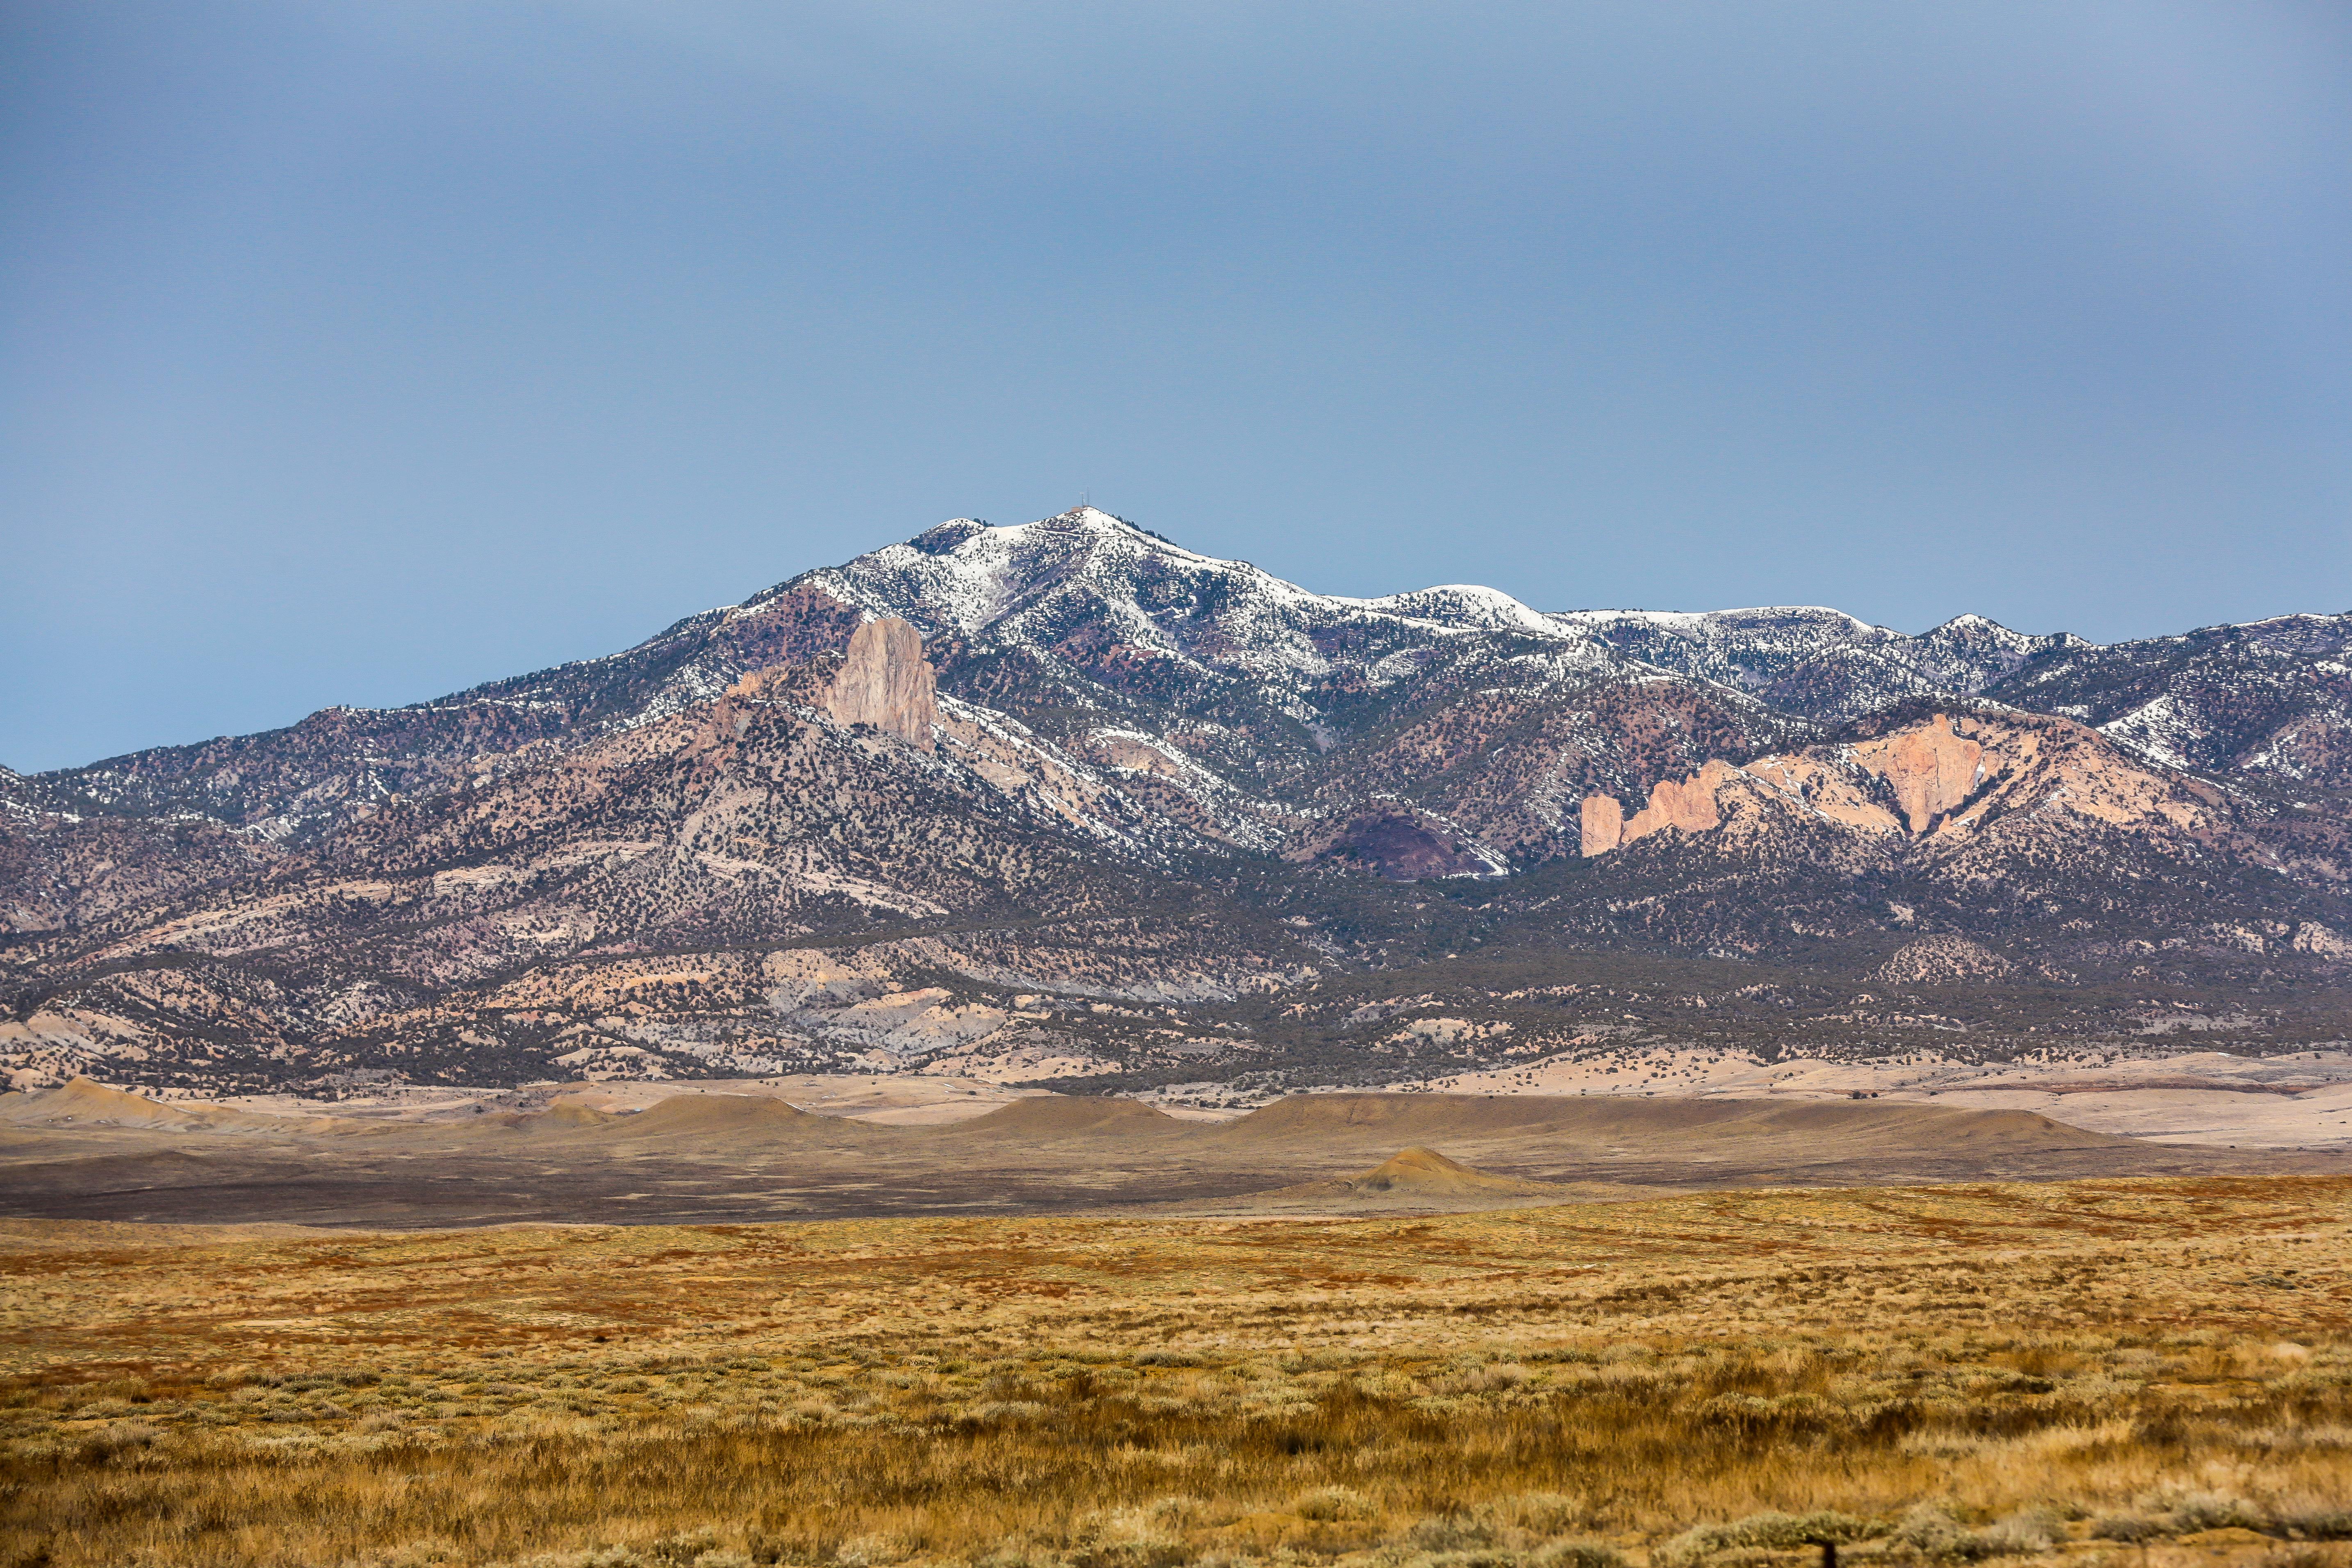 Speckled Peaks